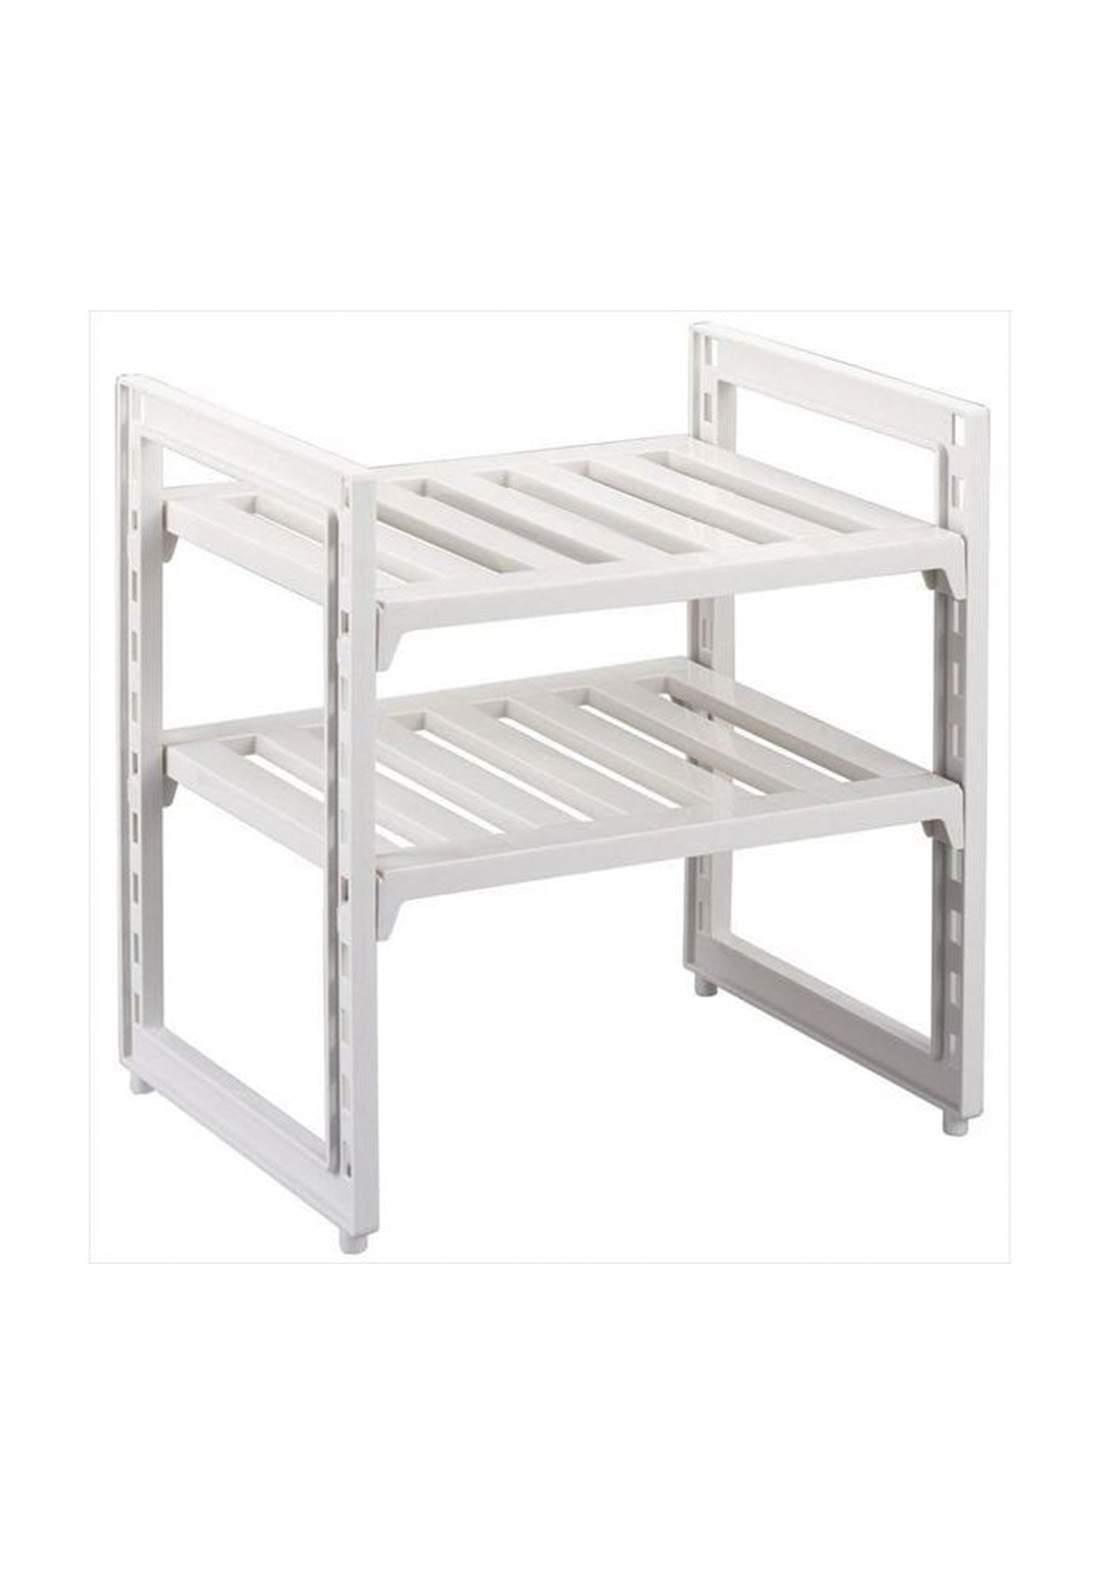 Pearl Metal H-9718 Arrangement Free 2 Shelves Under the Washbasin   رف متعدد الأستخدام